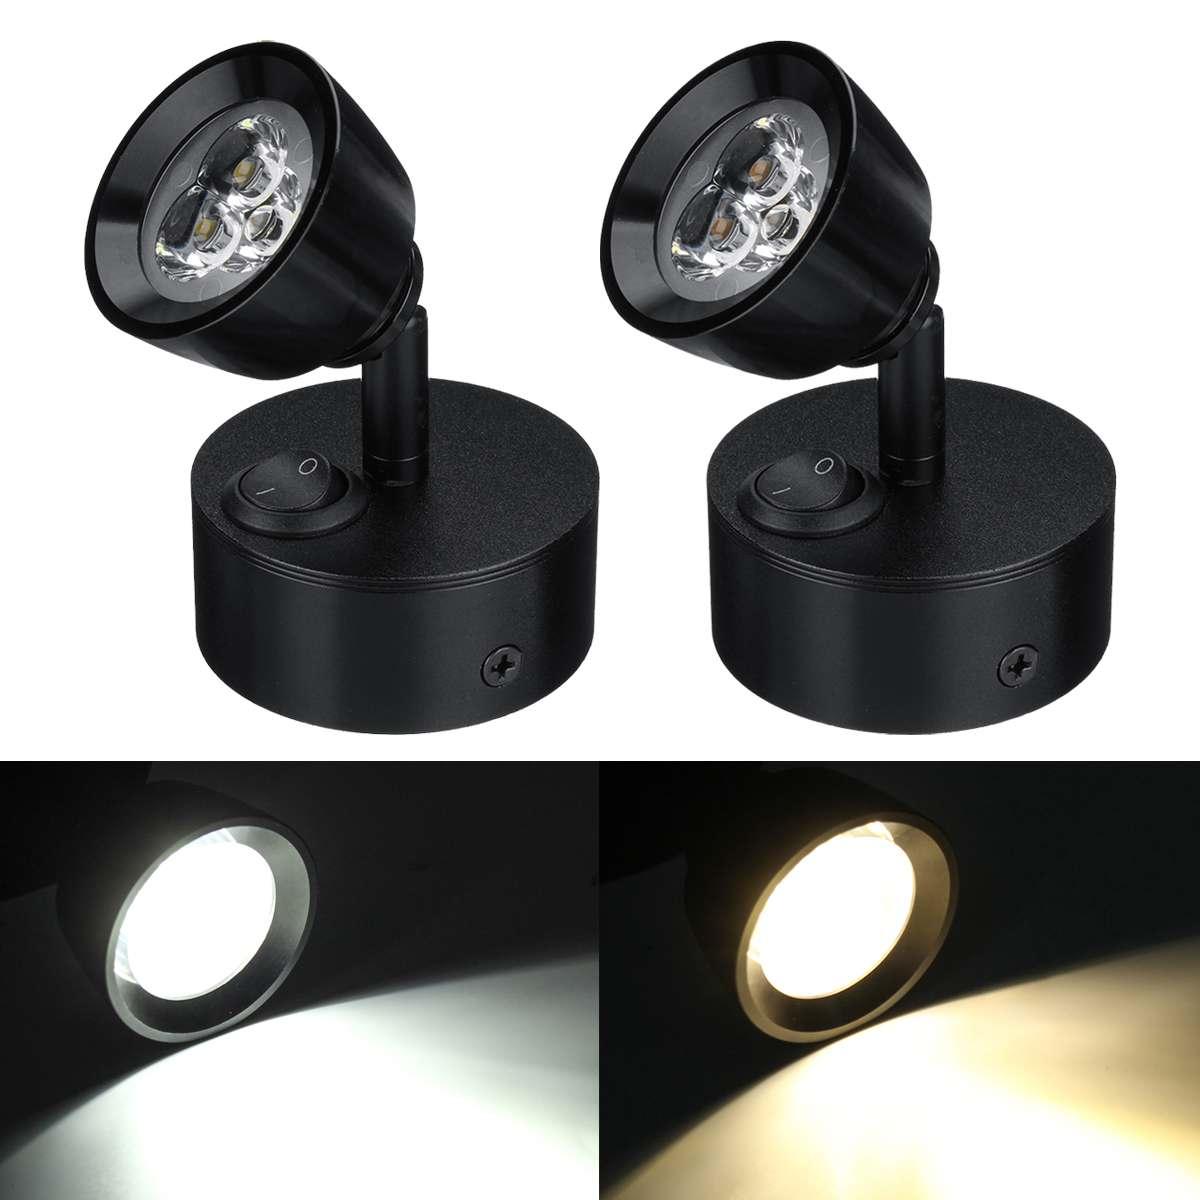 Foco LED de 12-24V luces interiores RV mesilla de noche gabinete de pared para la cocina lámpara de 3W para camión barco